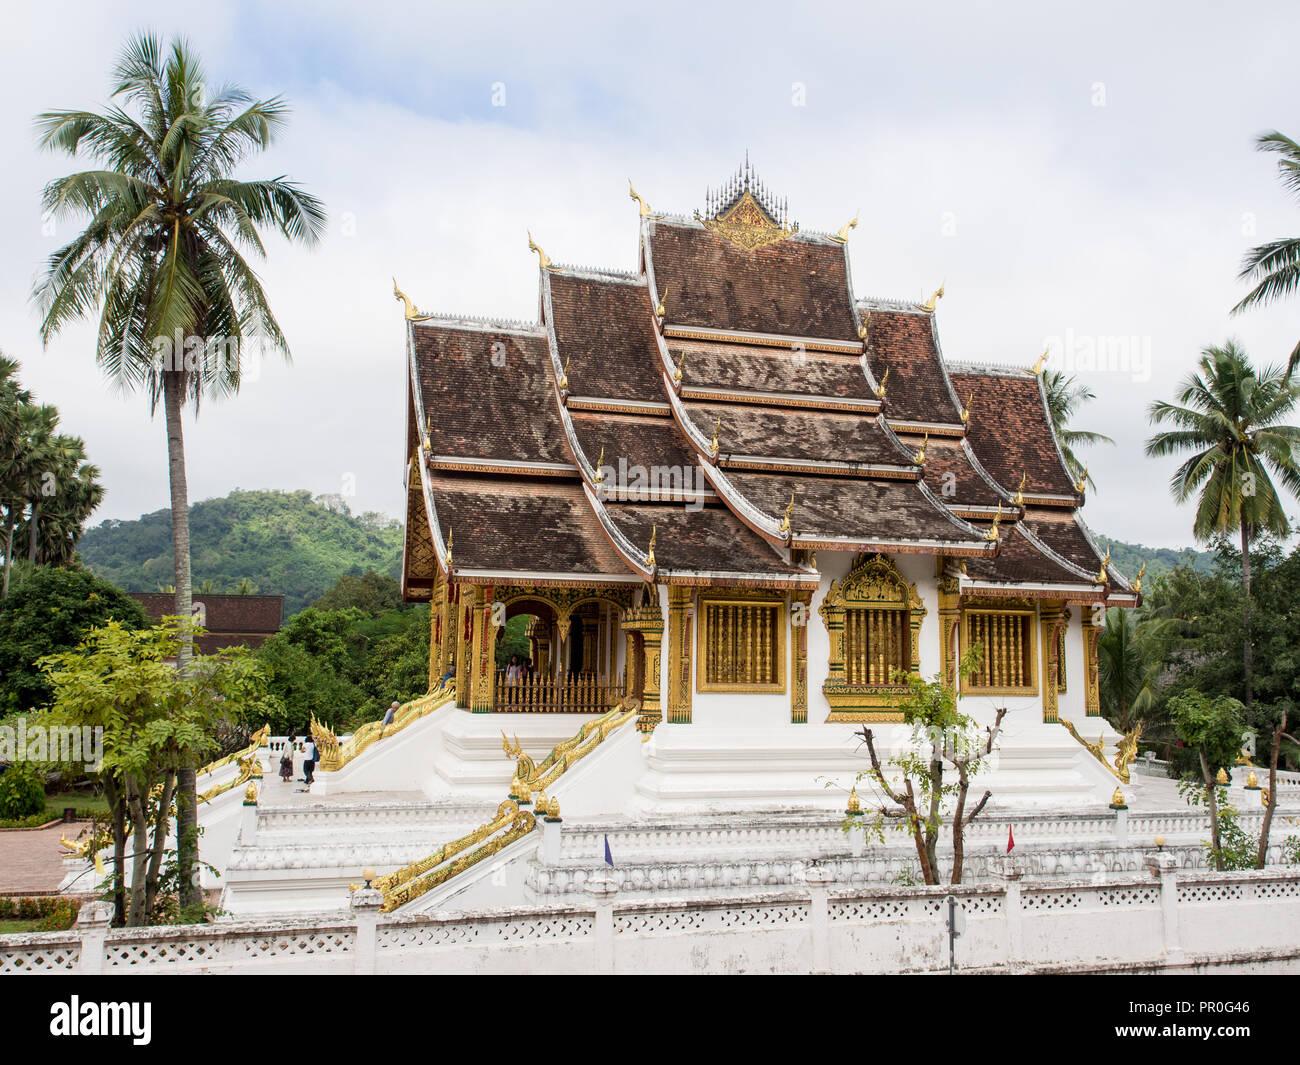 Haw Pha Bang temple, partie du complexe du Musée National, Luang Prabang, Laos, Indochine, Asie du Sud, Asie Photo Stock